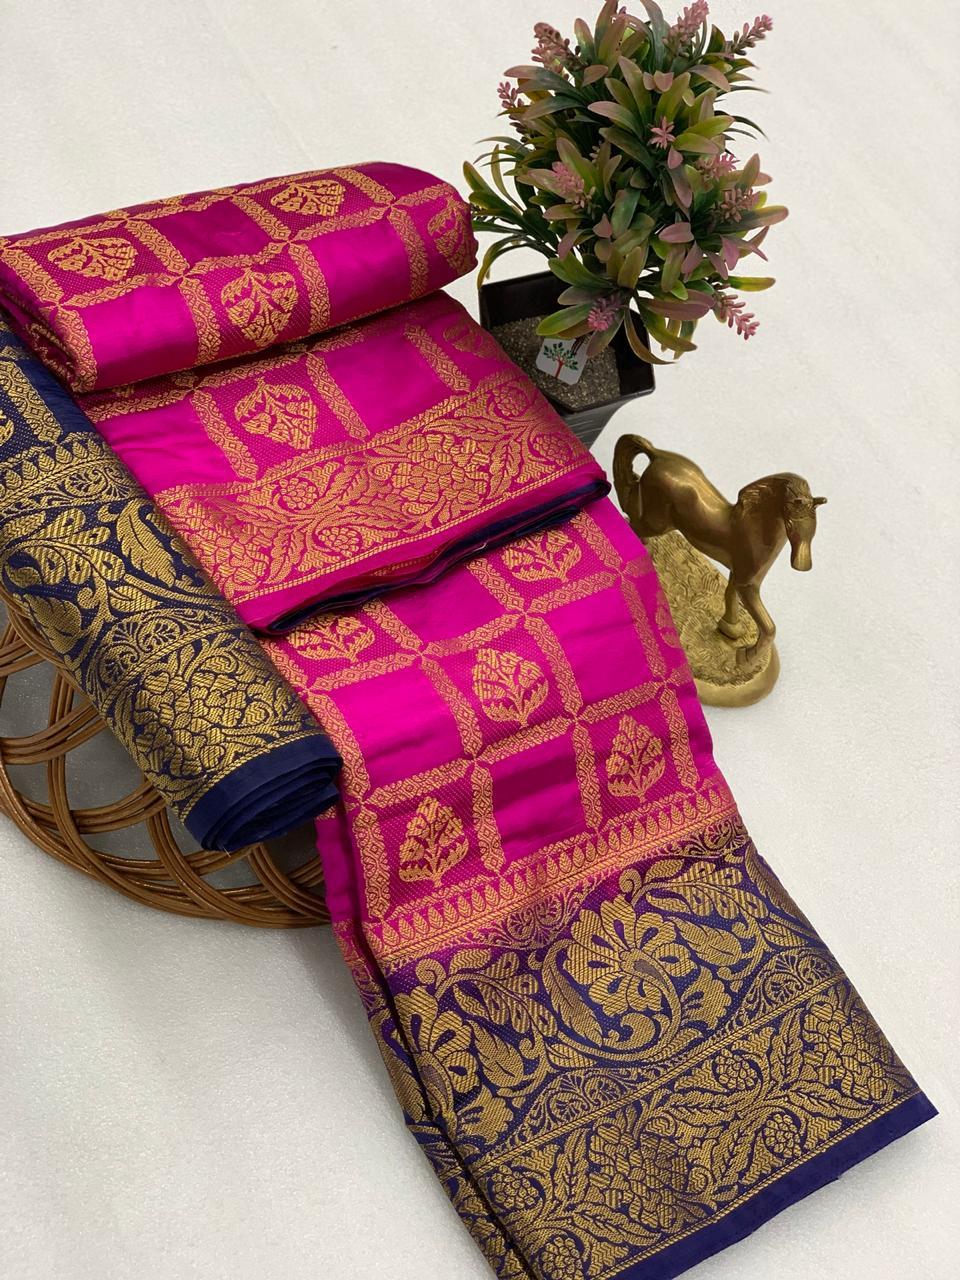 Thankar Kk-004 Wedding And Festive Silk Saree Wear Catalog at Wholesale rate